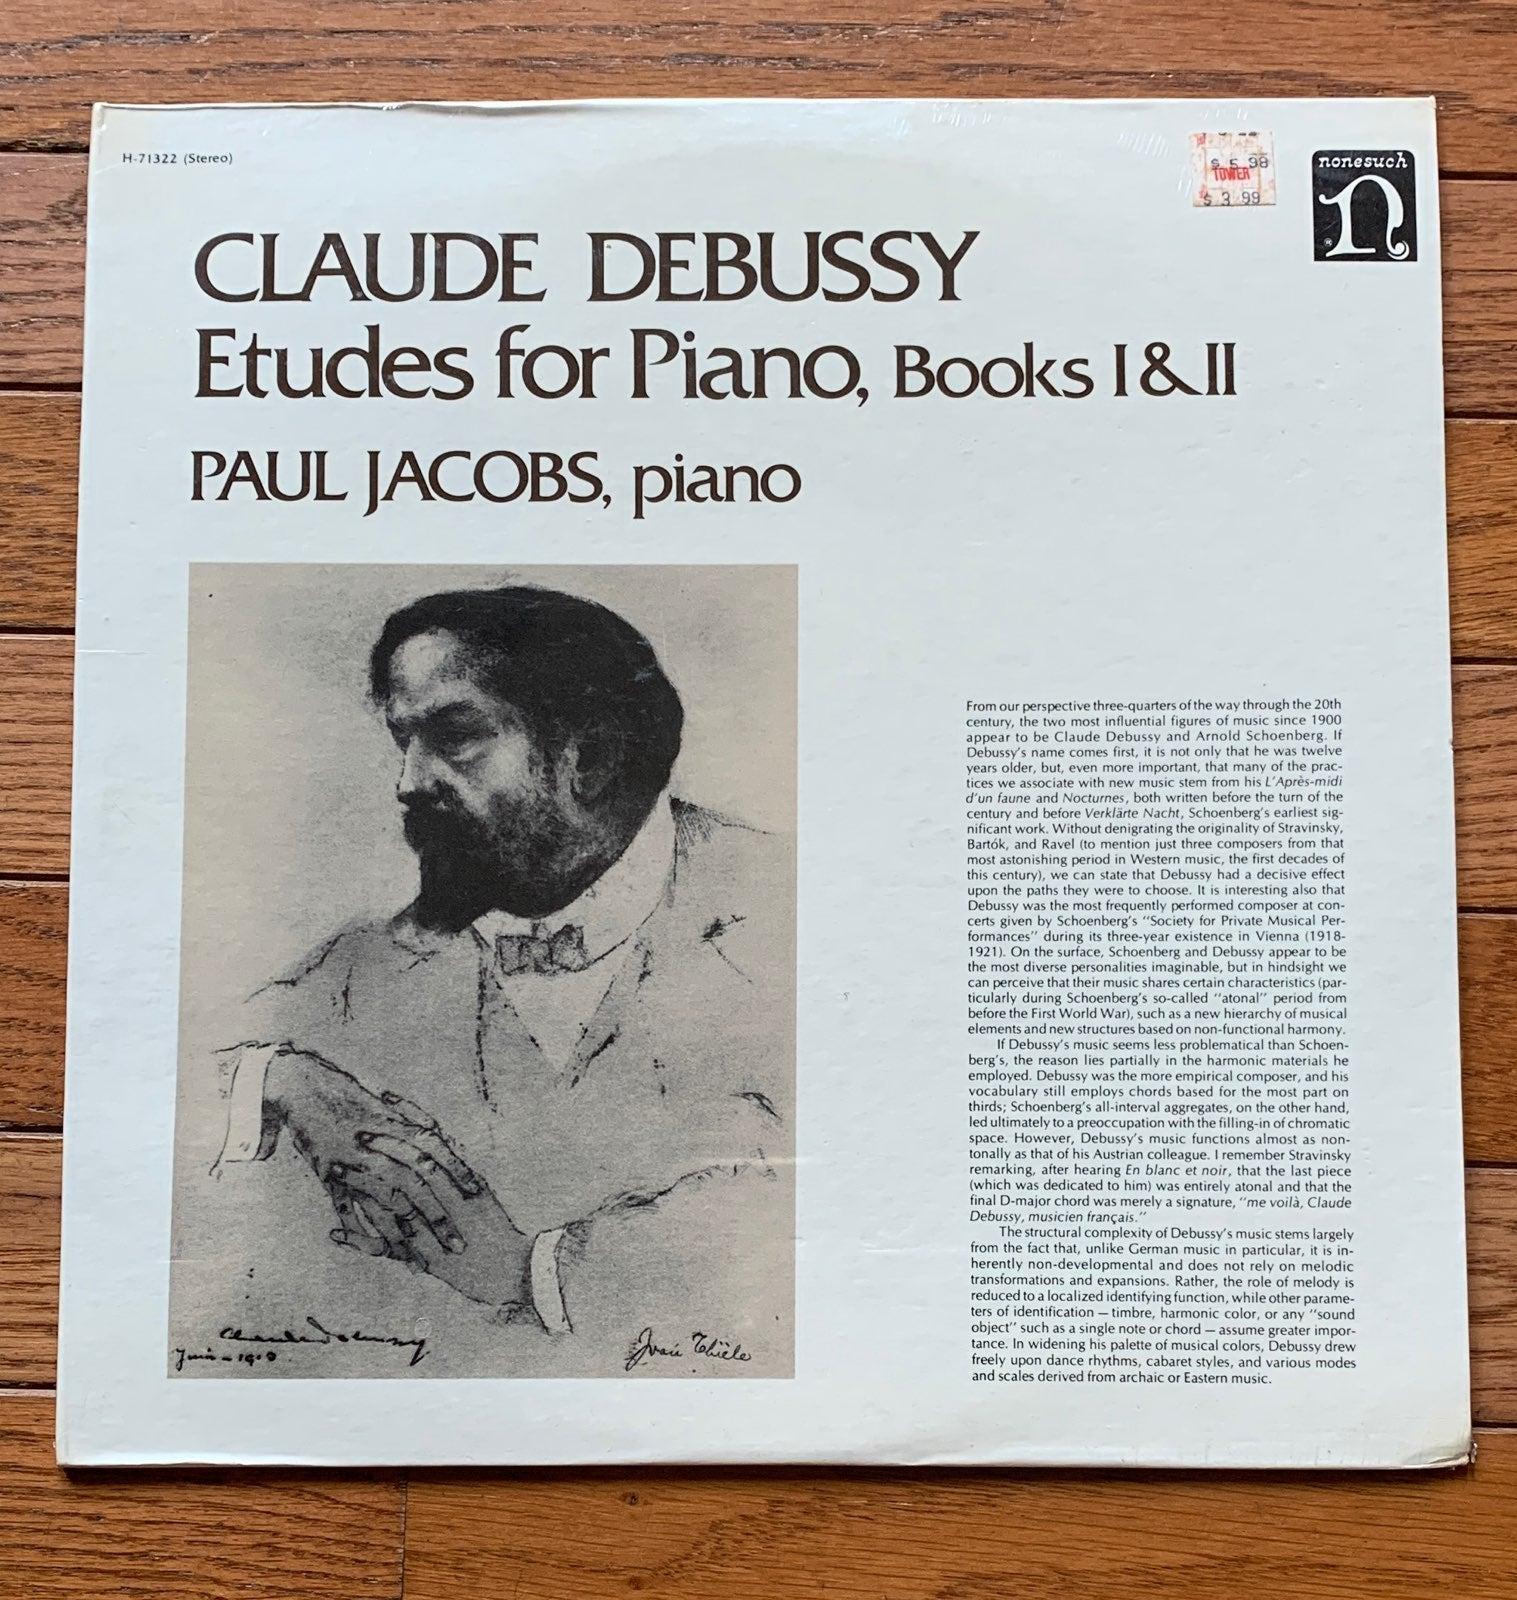 Sealed Debussy Etudes Vinyl Record Lp